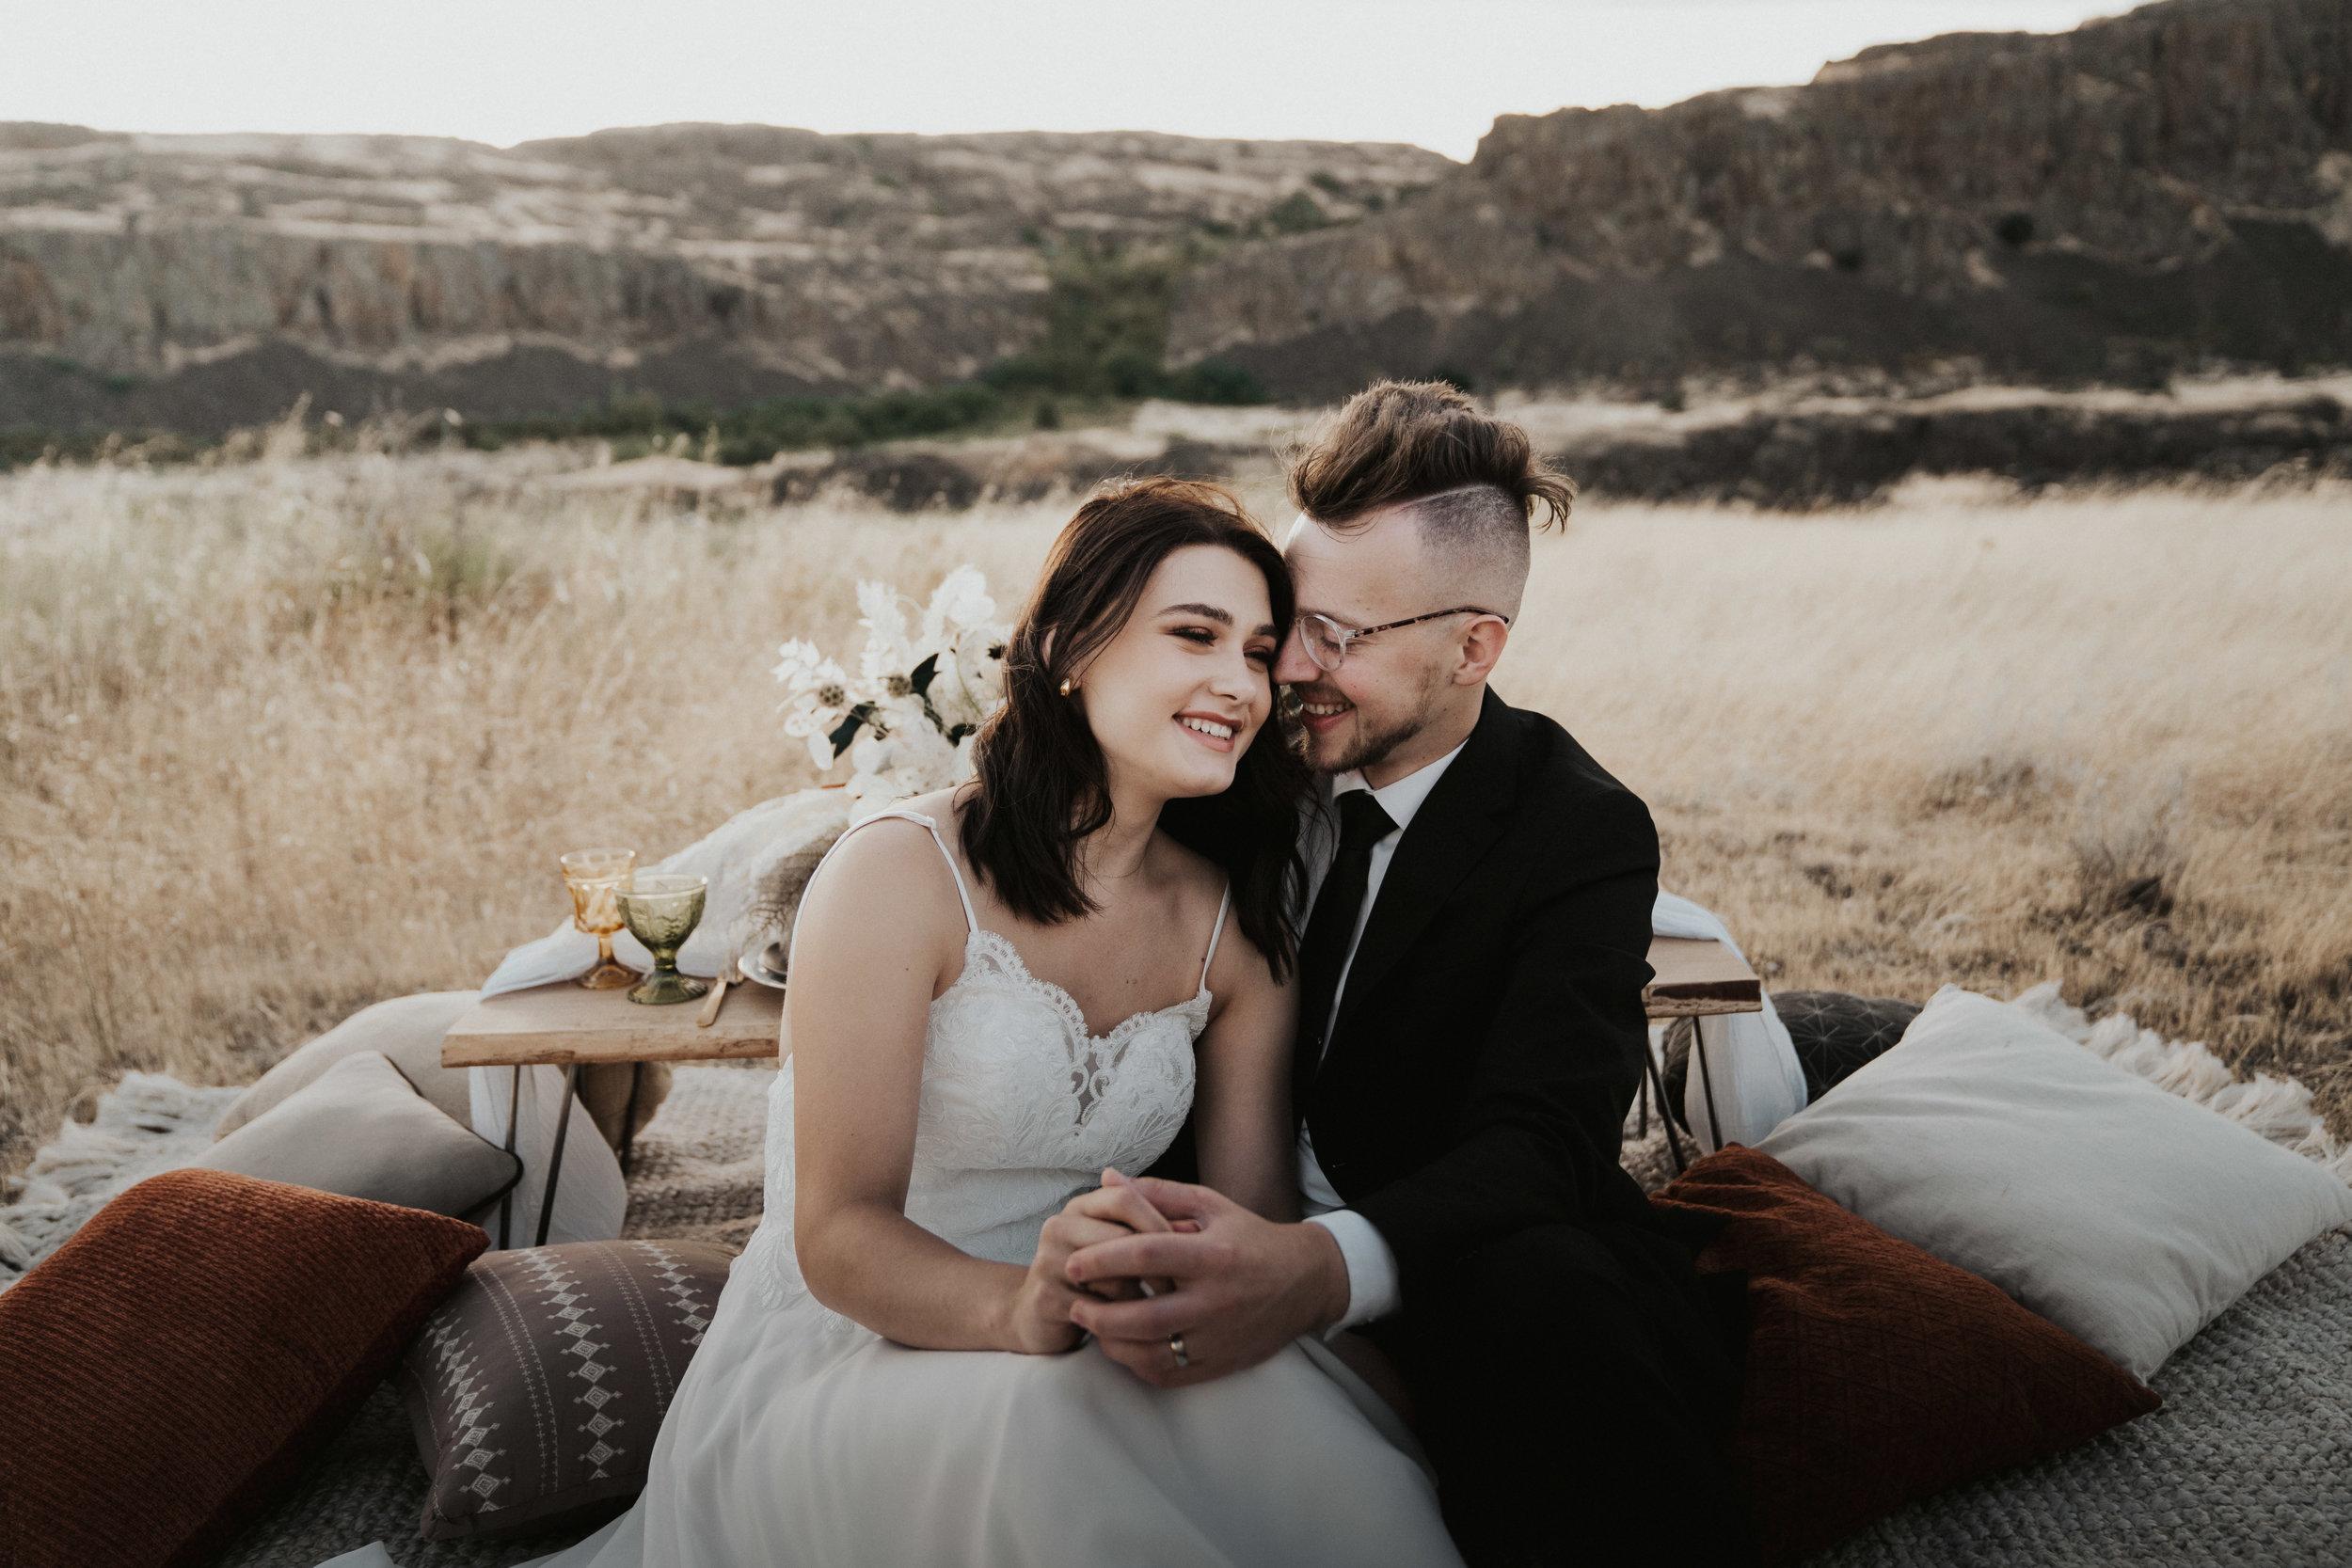 columbia-river-gorge-wedding-elopement-inspiration-4.jpg